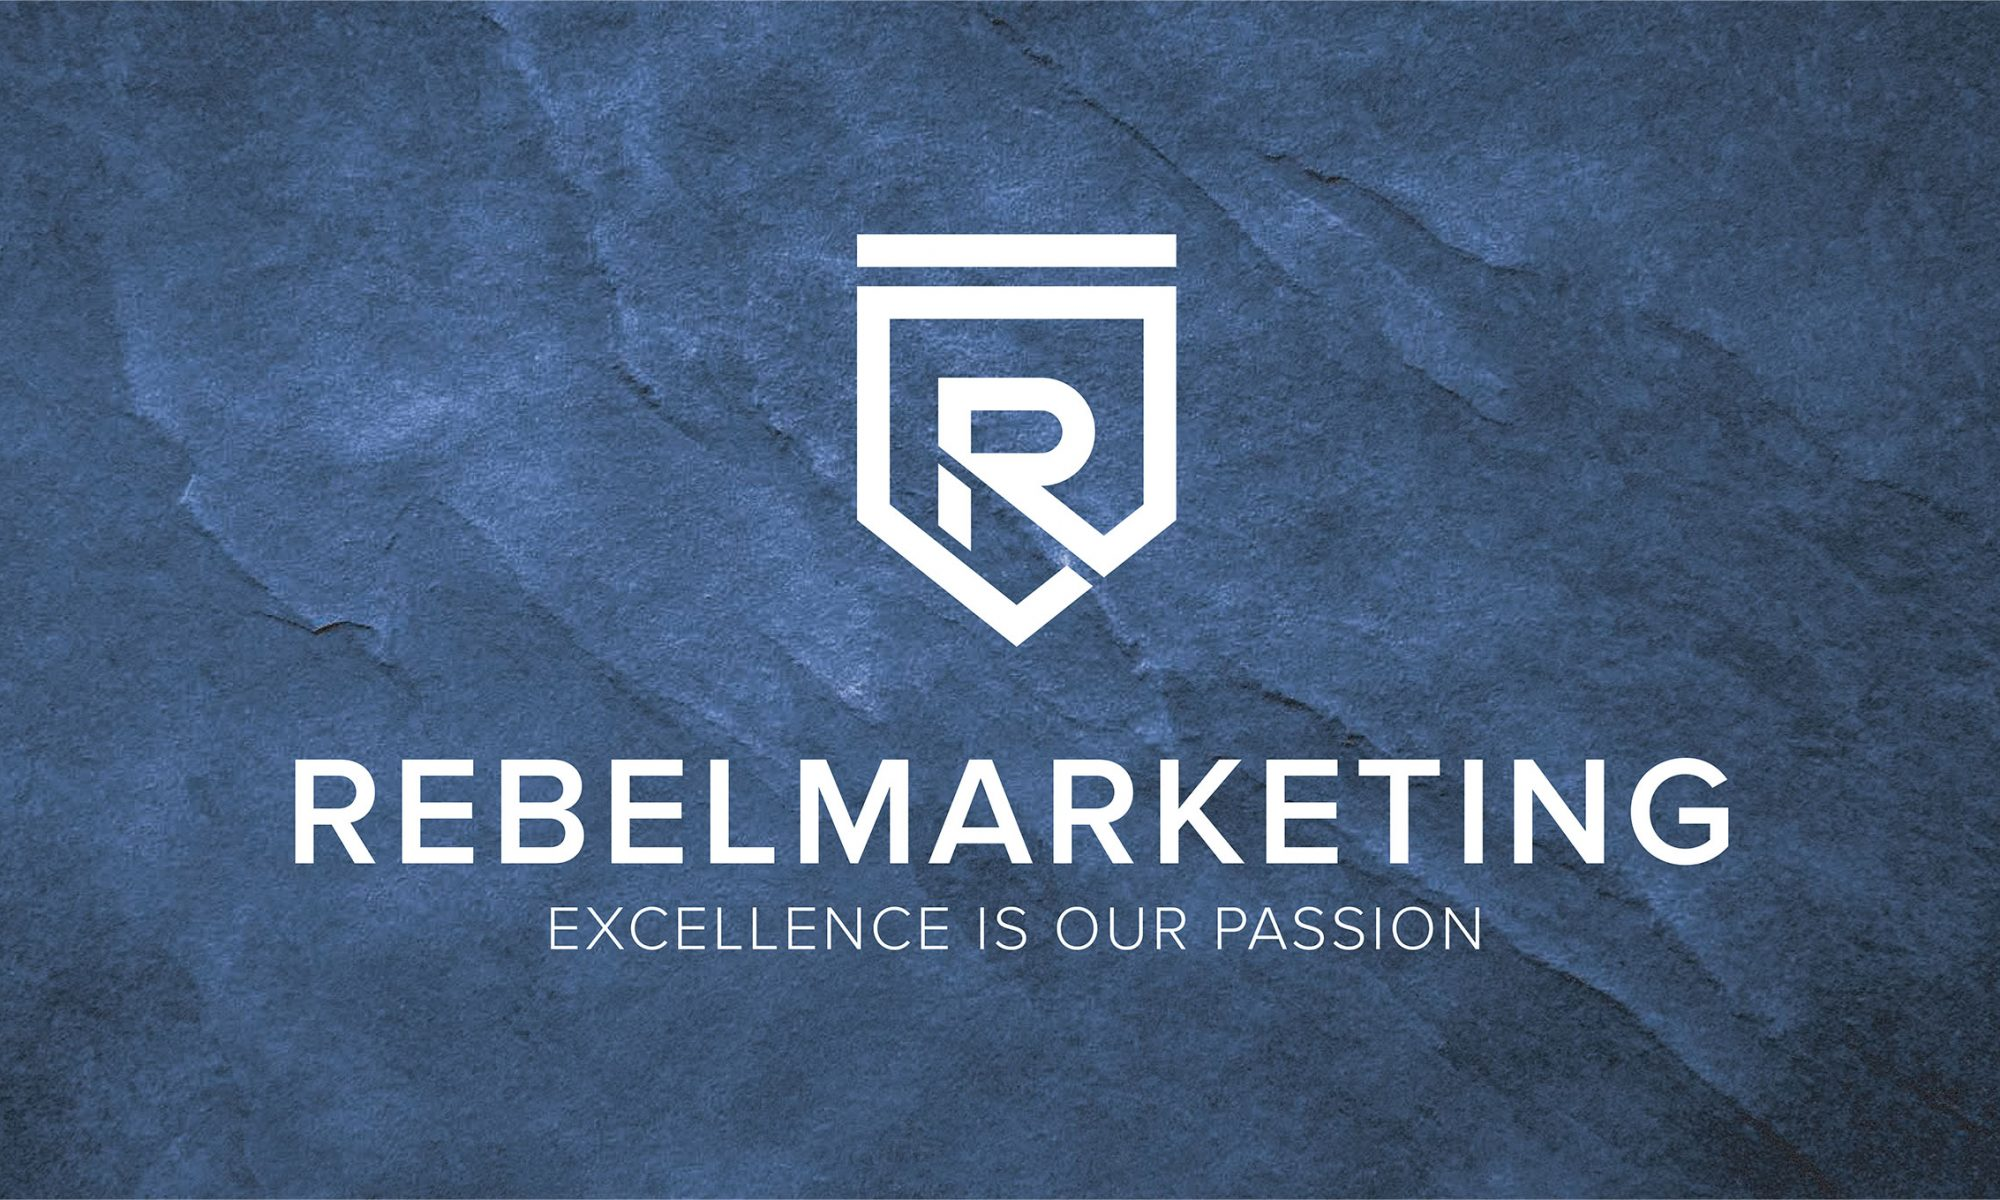 Rebelmarketing